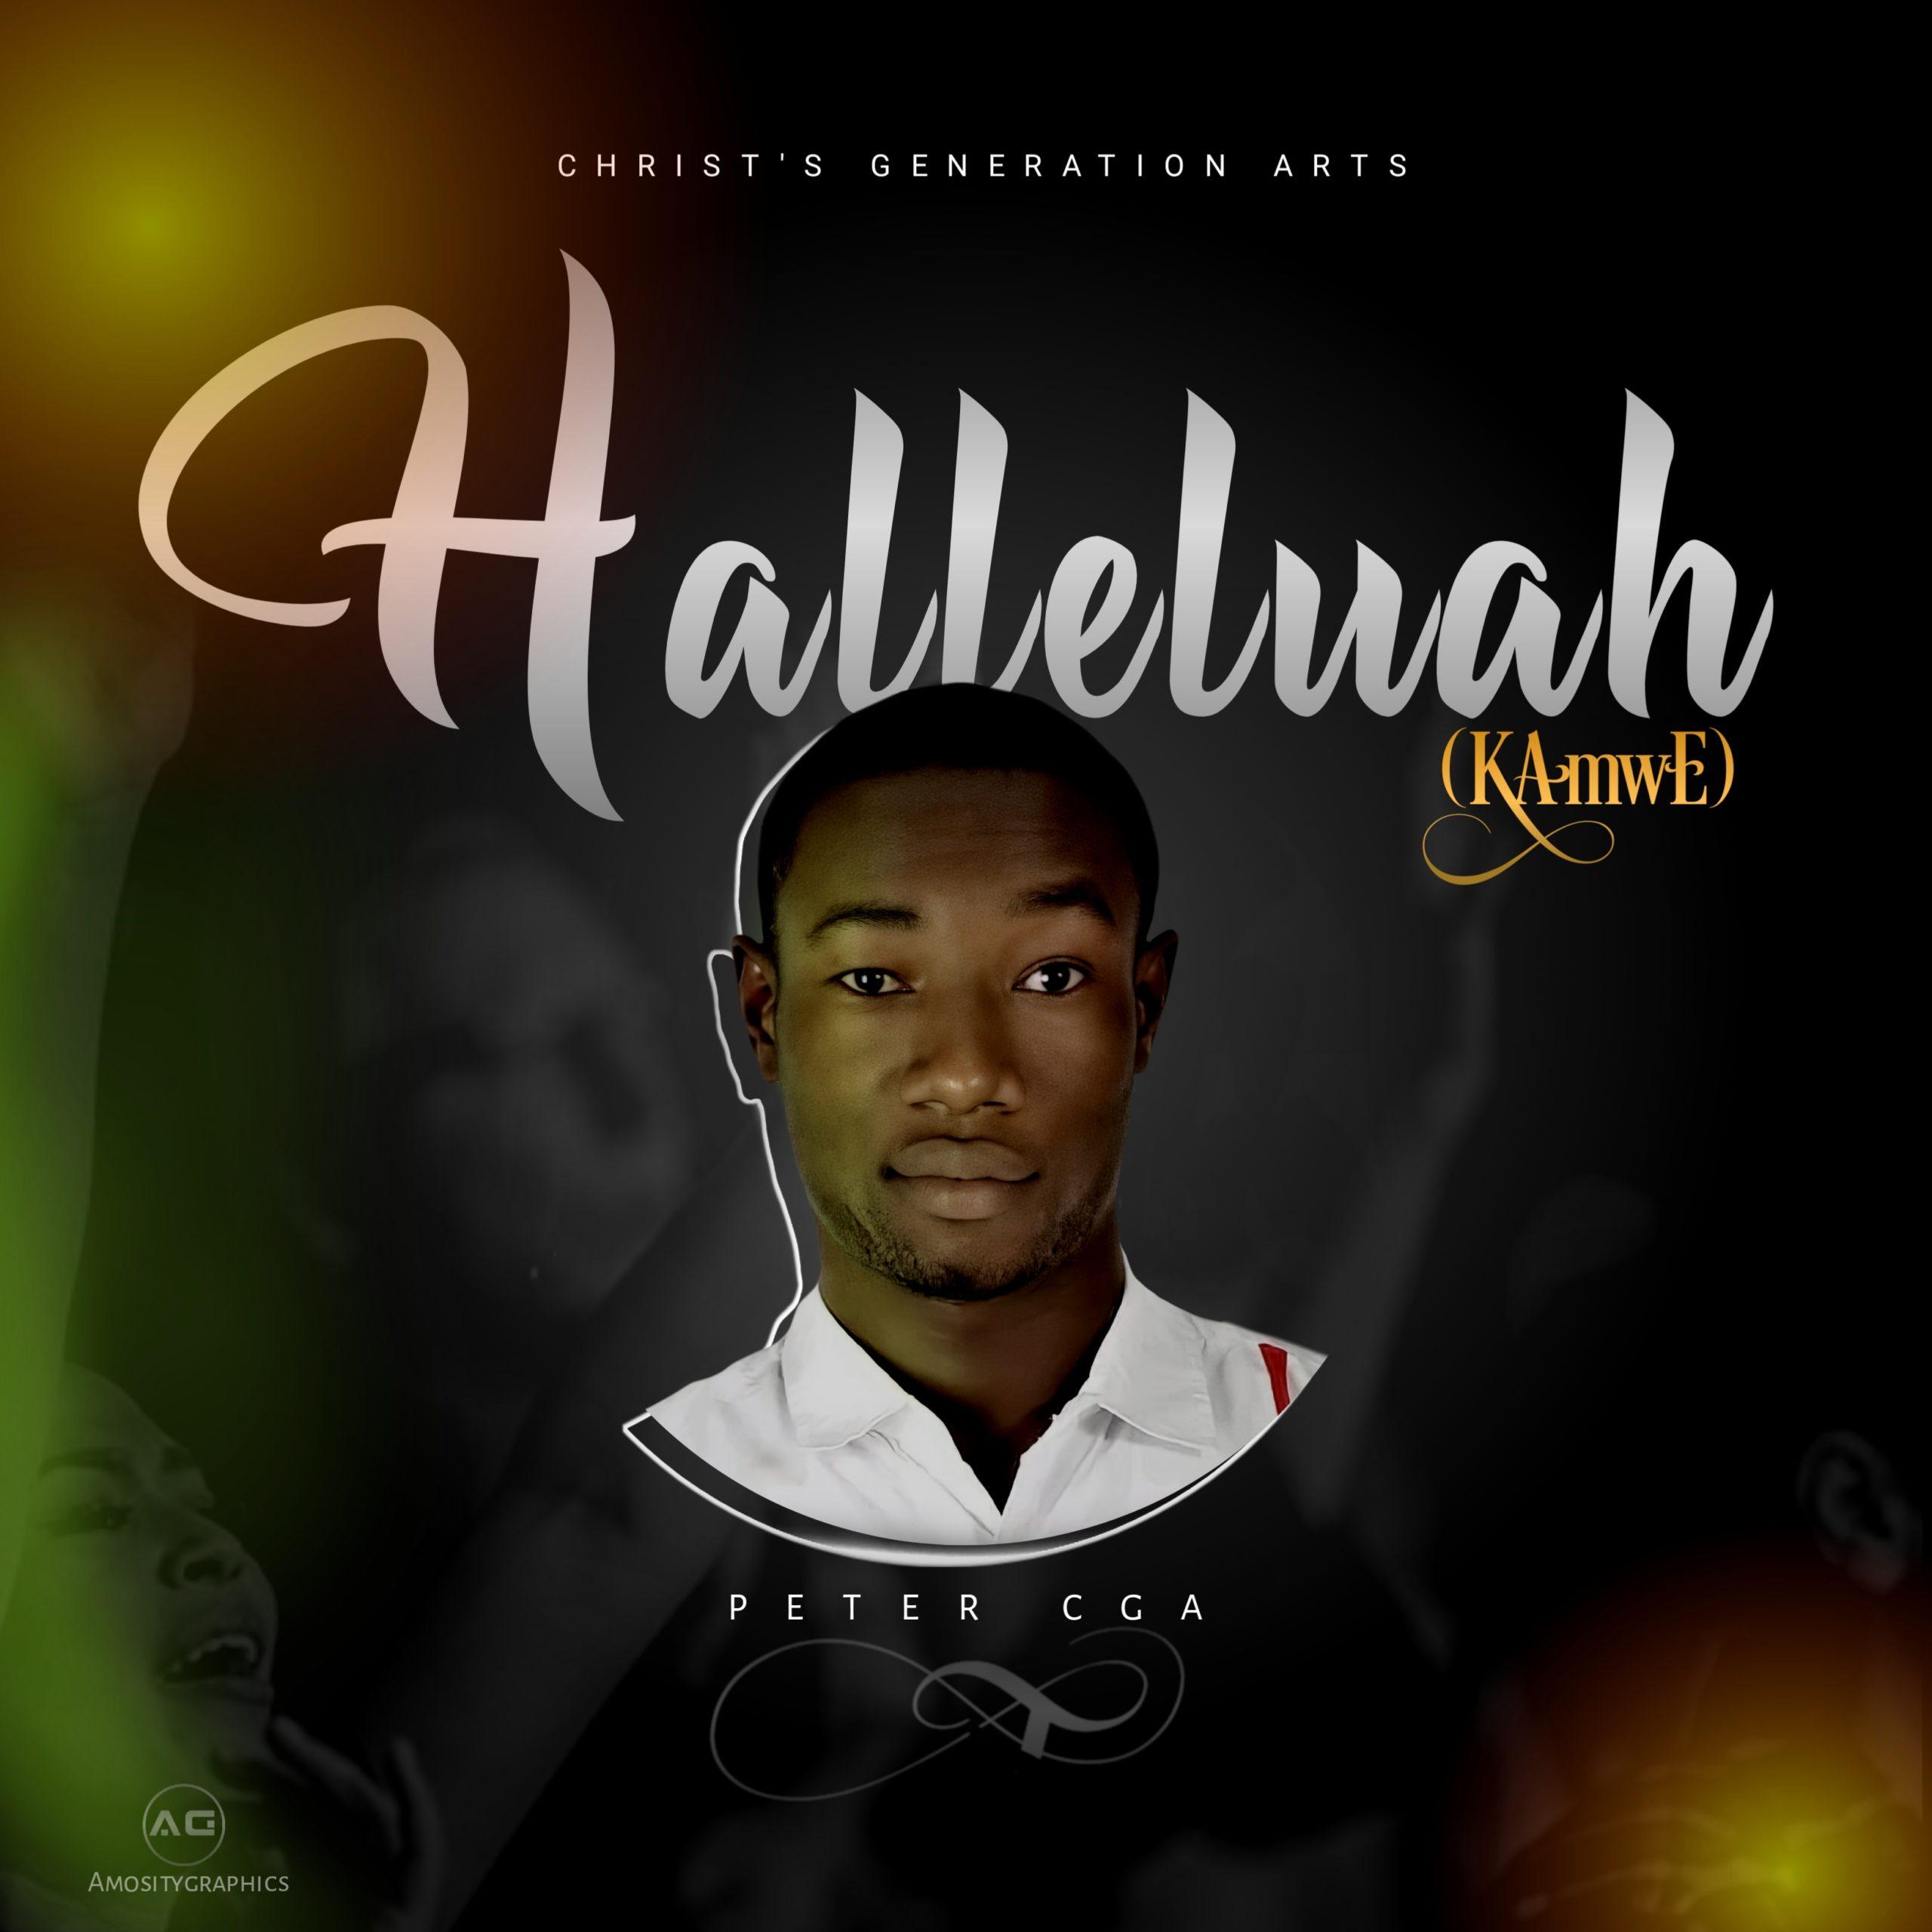 DOWNLOAD MP3: Peter Kwaha CGA – Hallelujah (Kamwe)